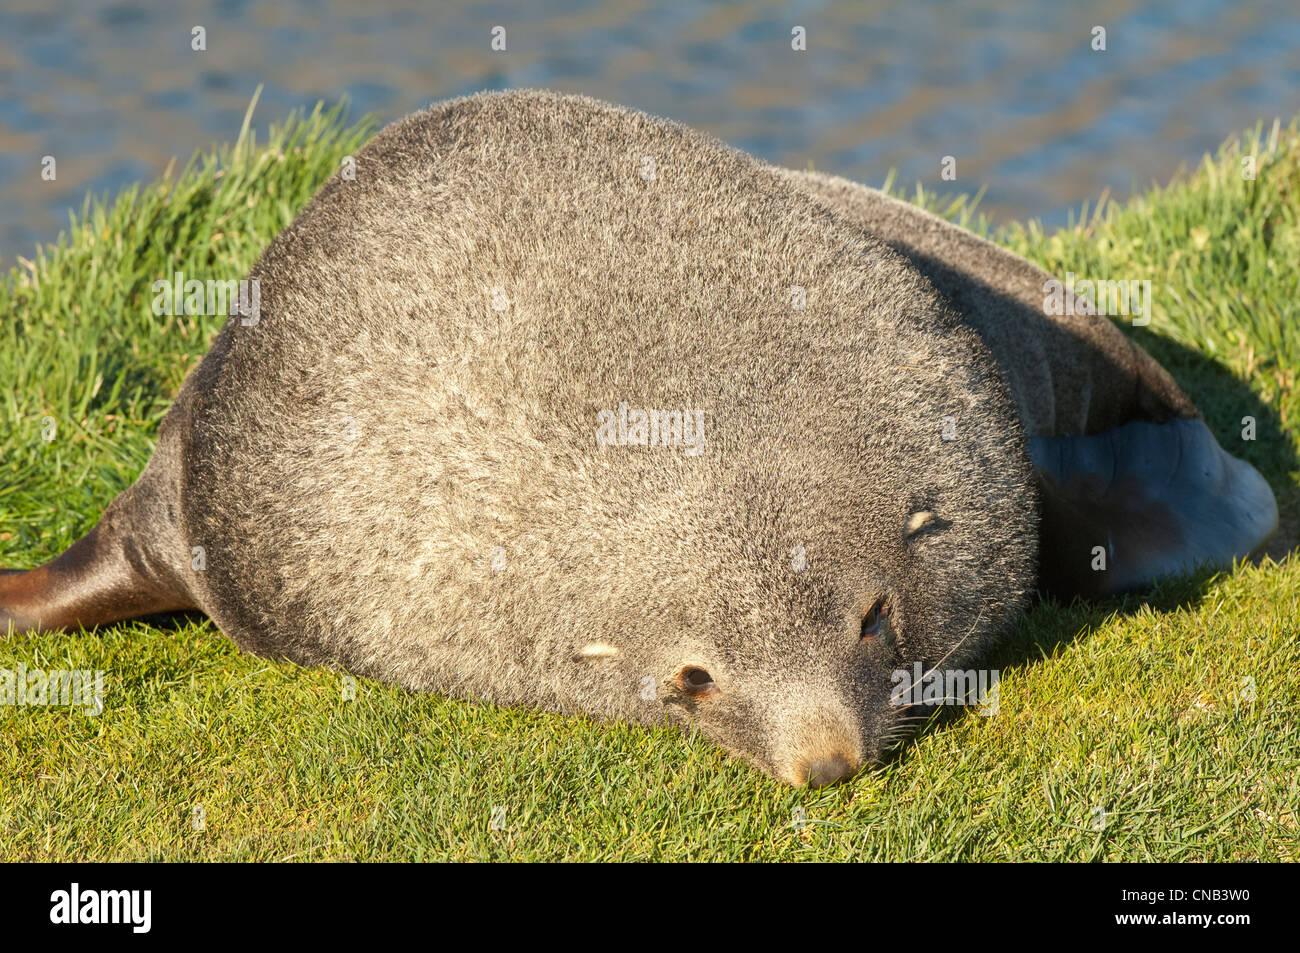 Antarctic Fur Seal (Arctocephalus gazella) Salisbury Plains, South Georgia - Stock Image